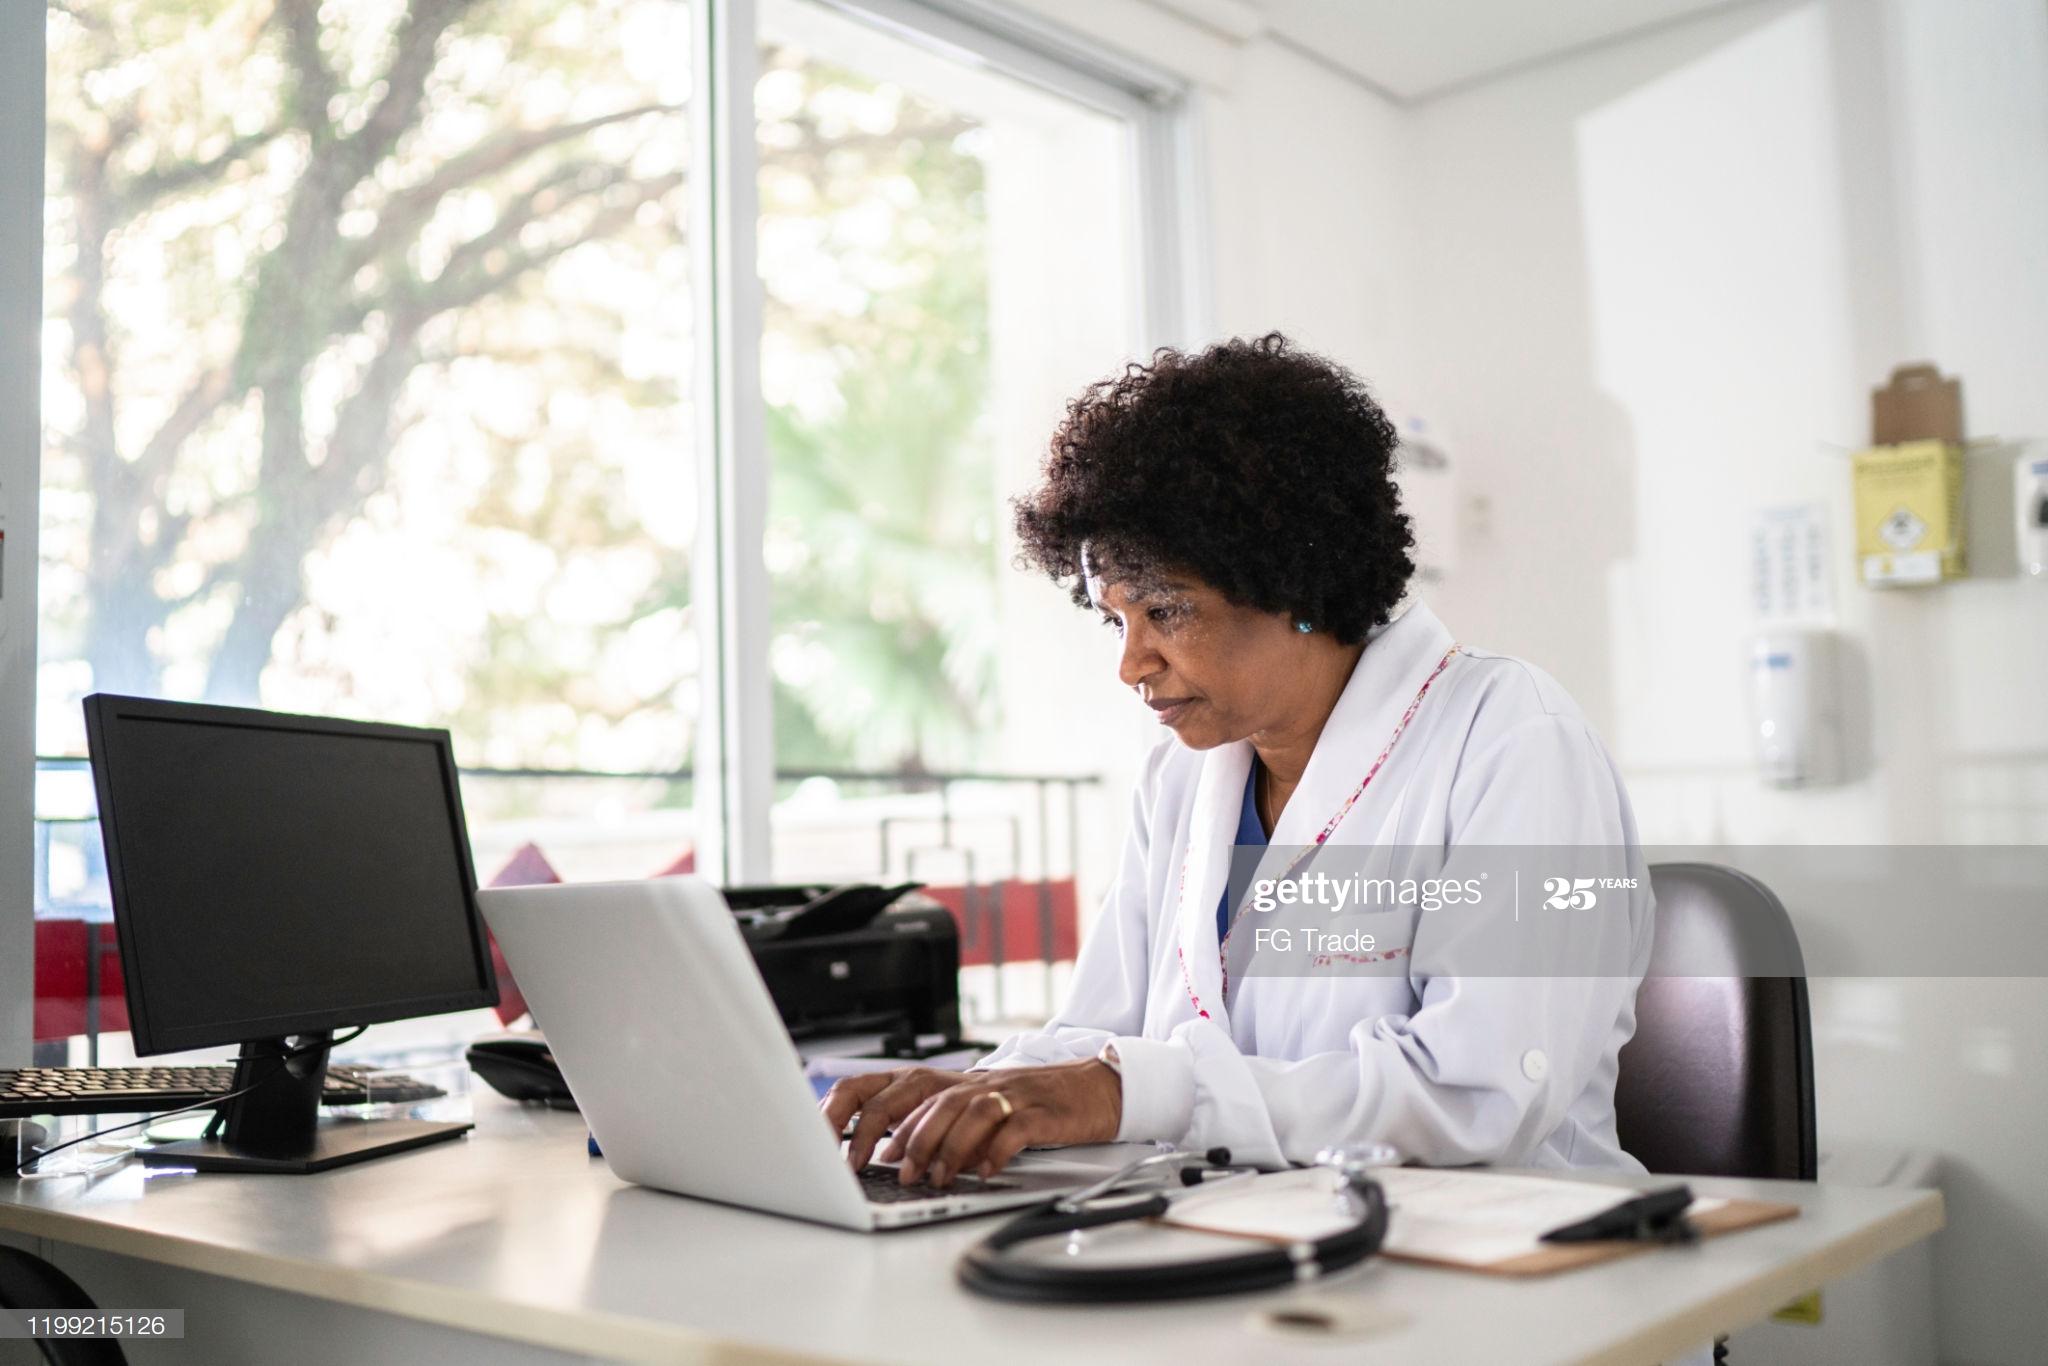 Leading Provider of Telemedicine Platforms